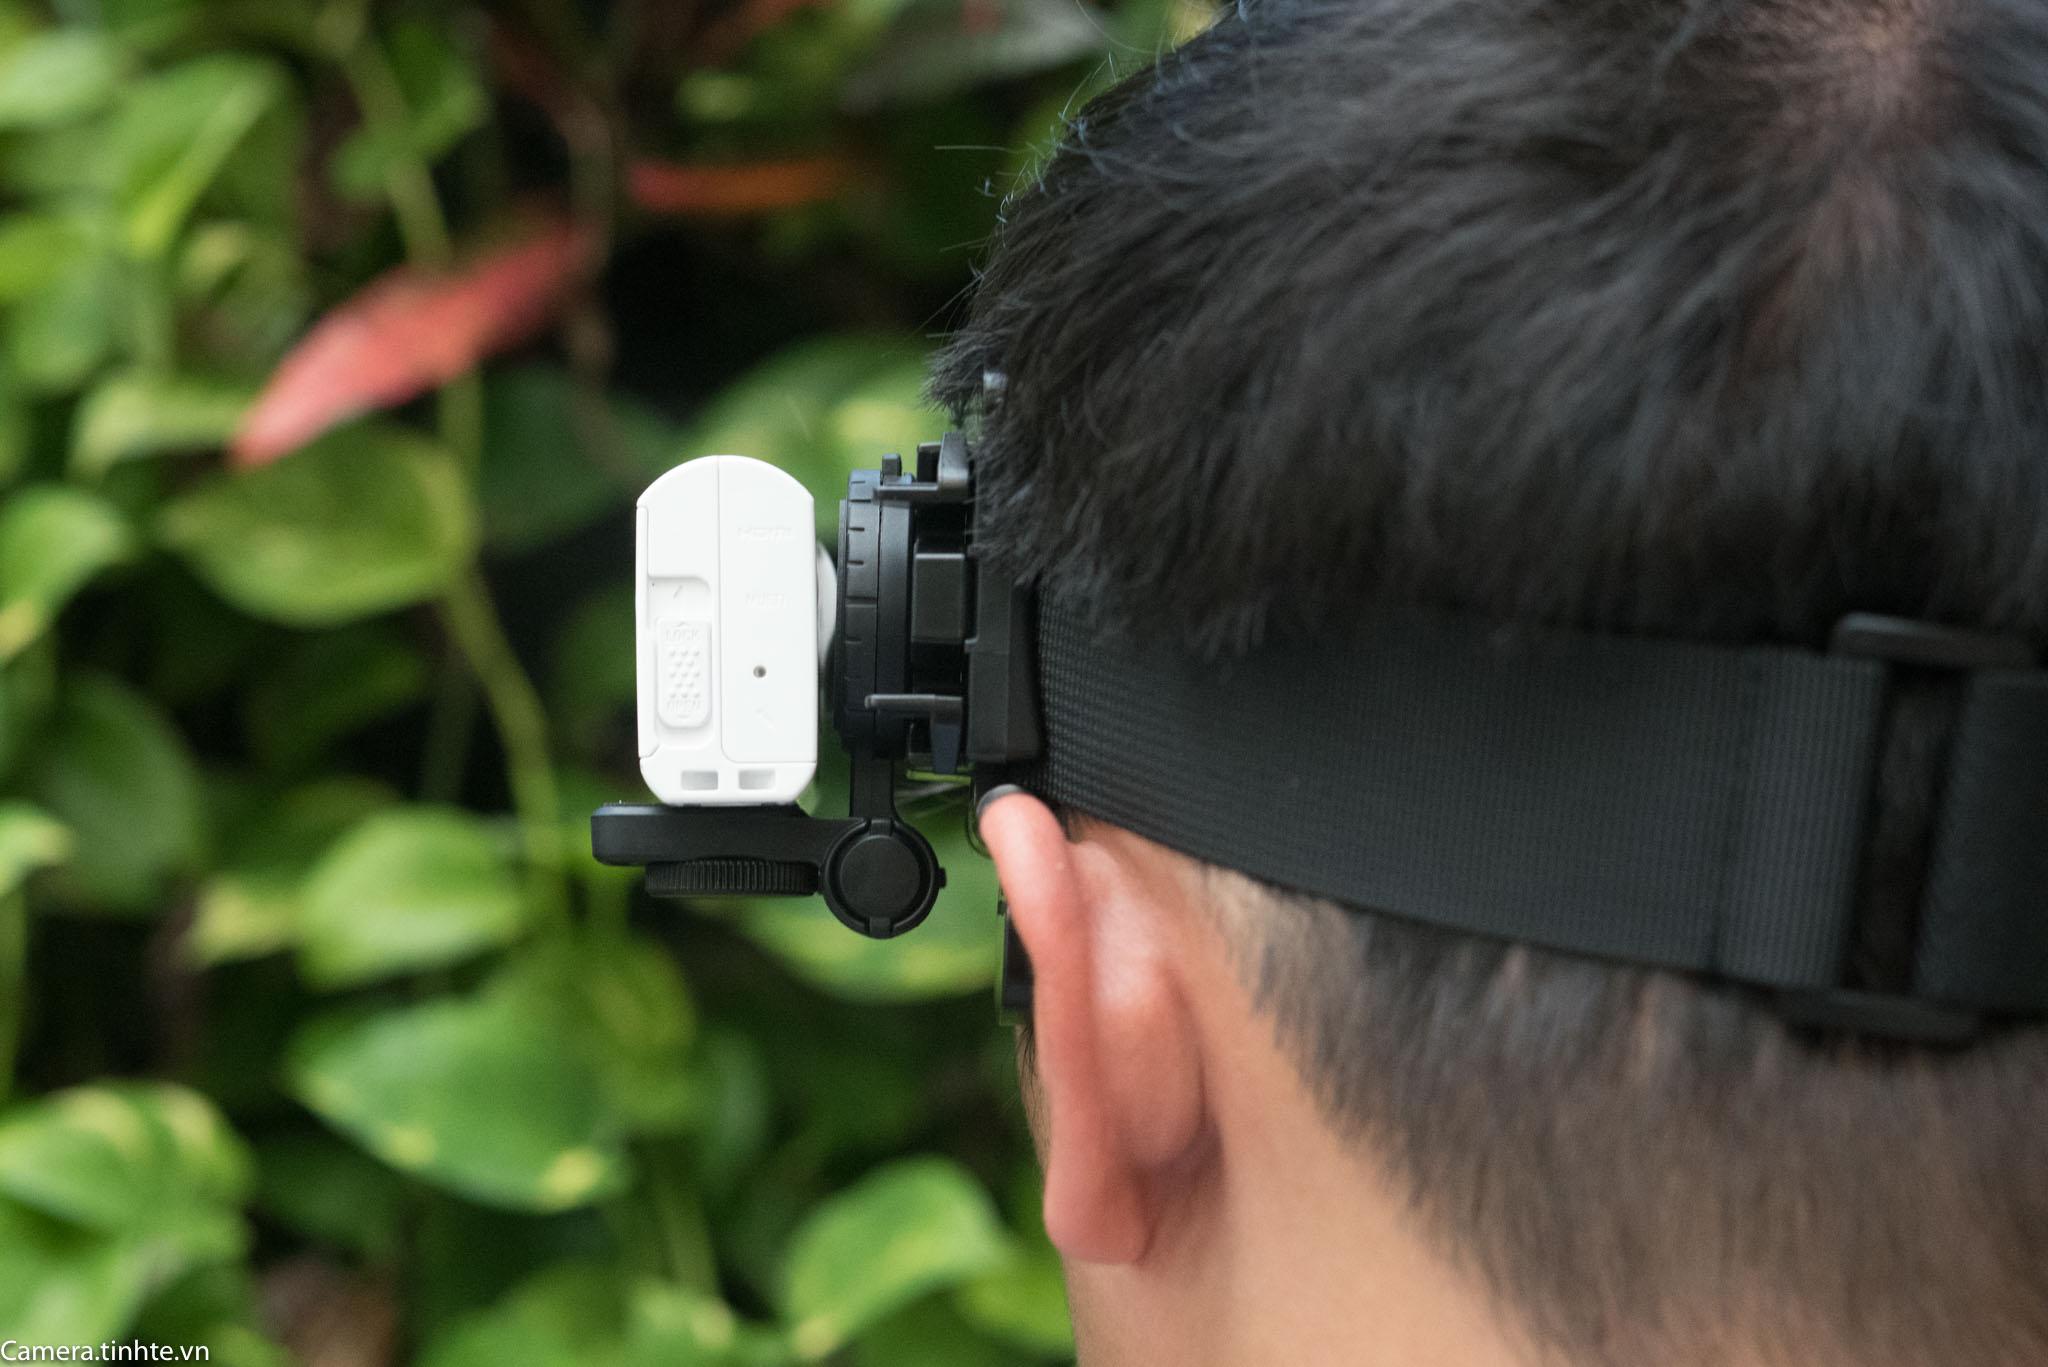 Phu kien Sony FDR-X3000 - Camera.tinhte.vn -4-2.jpg